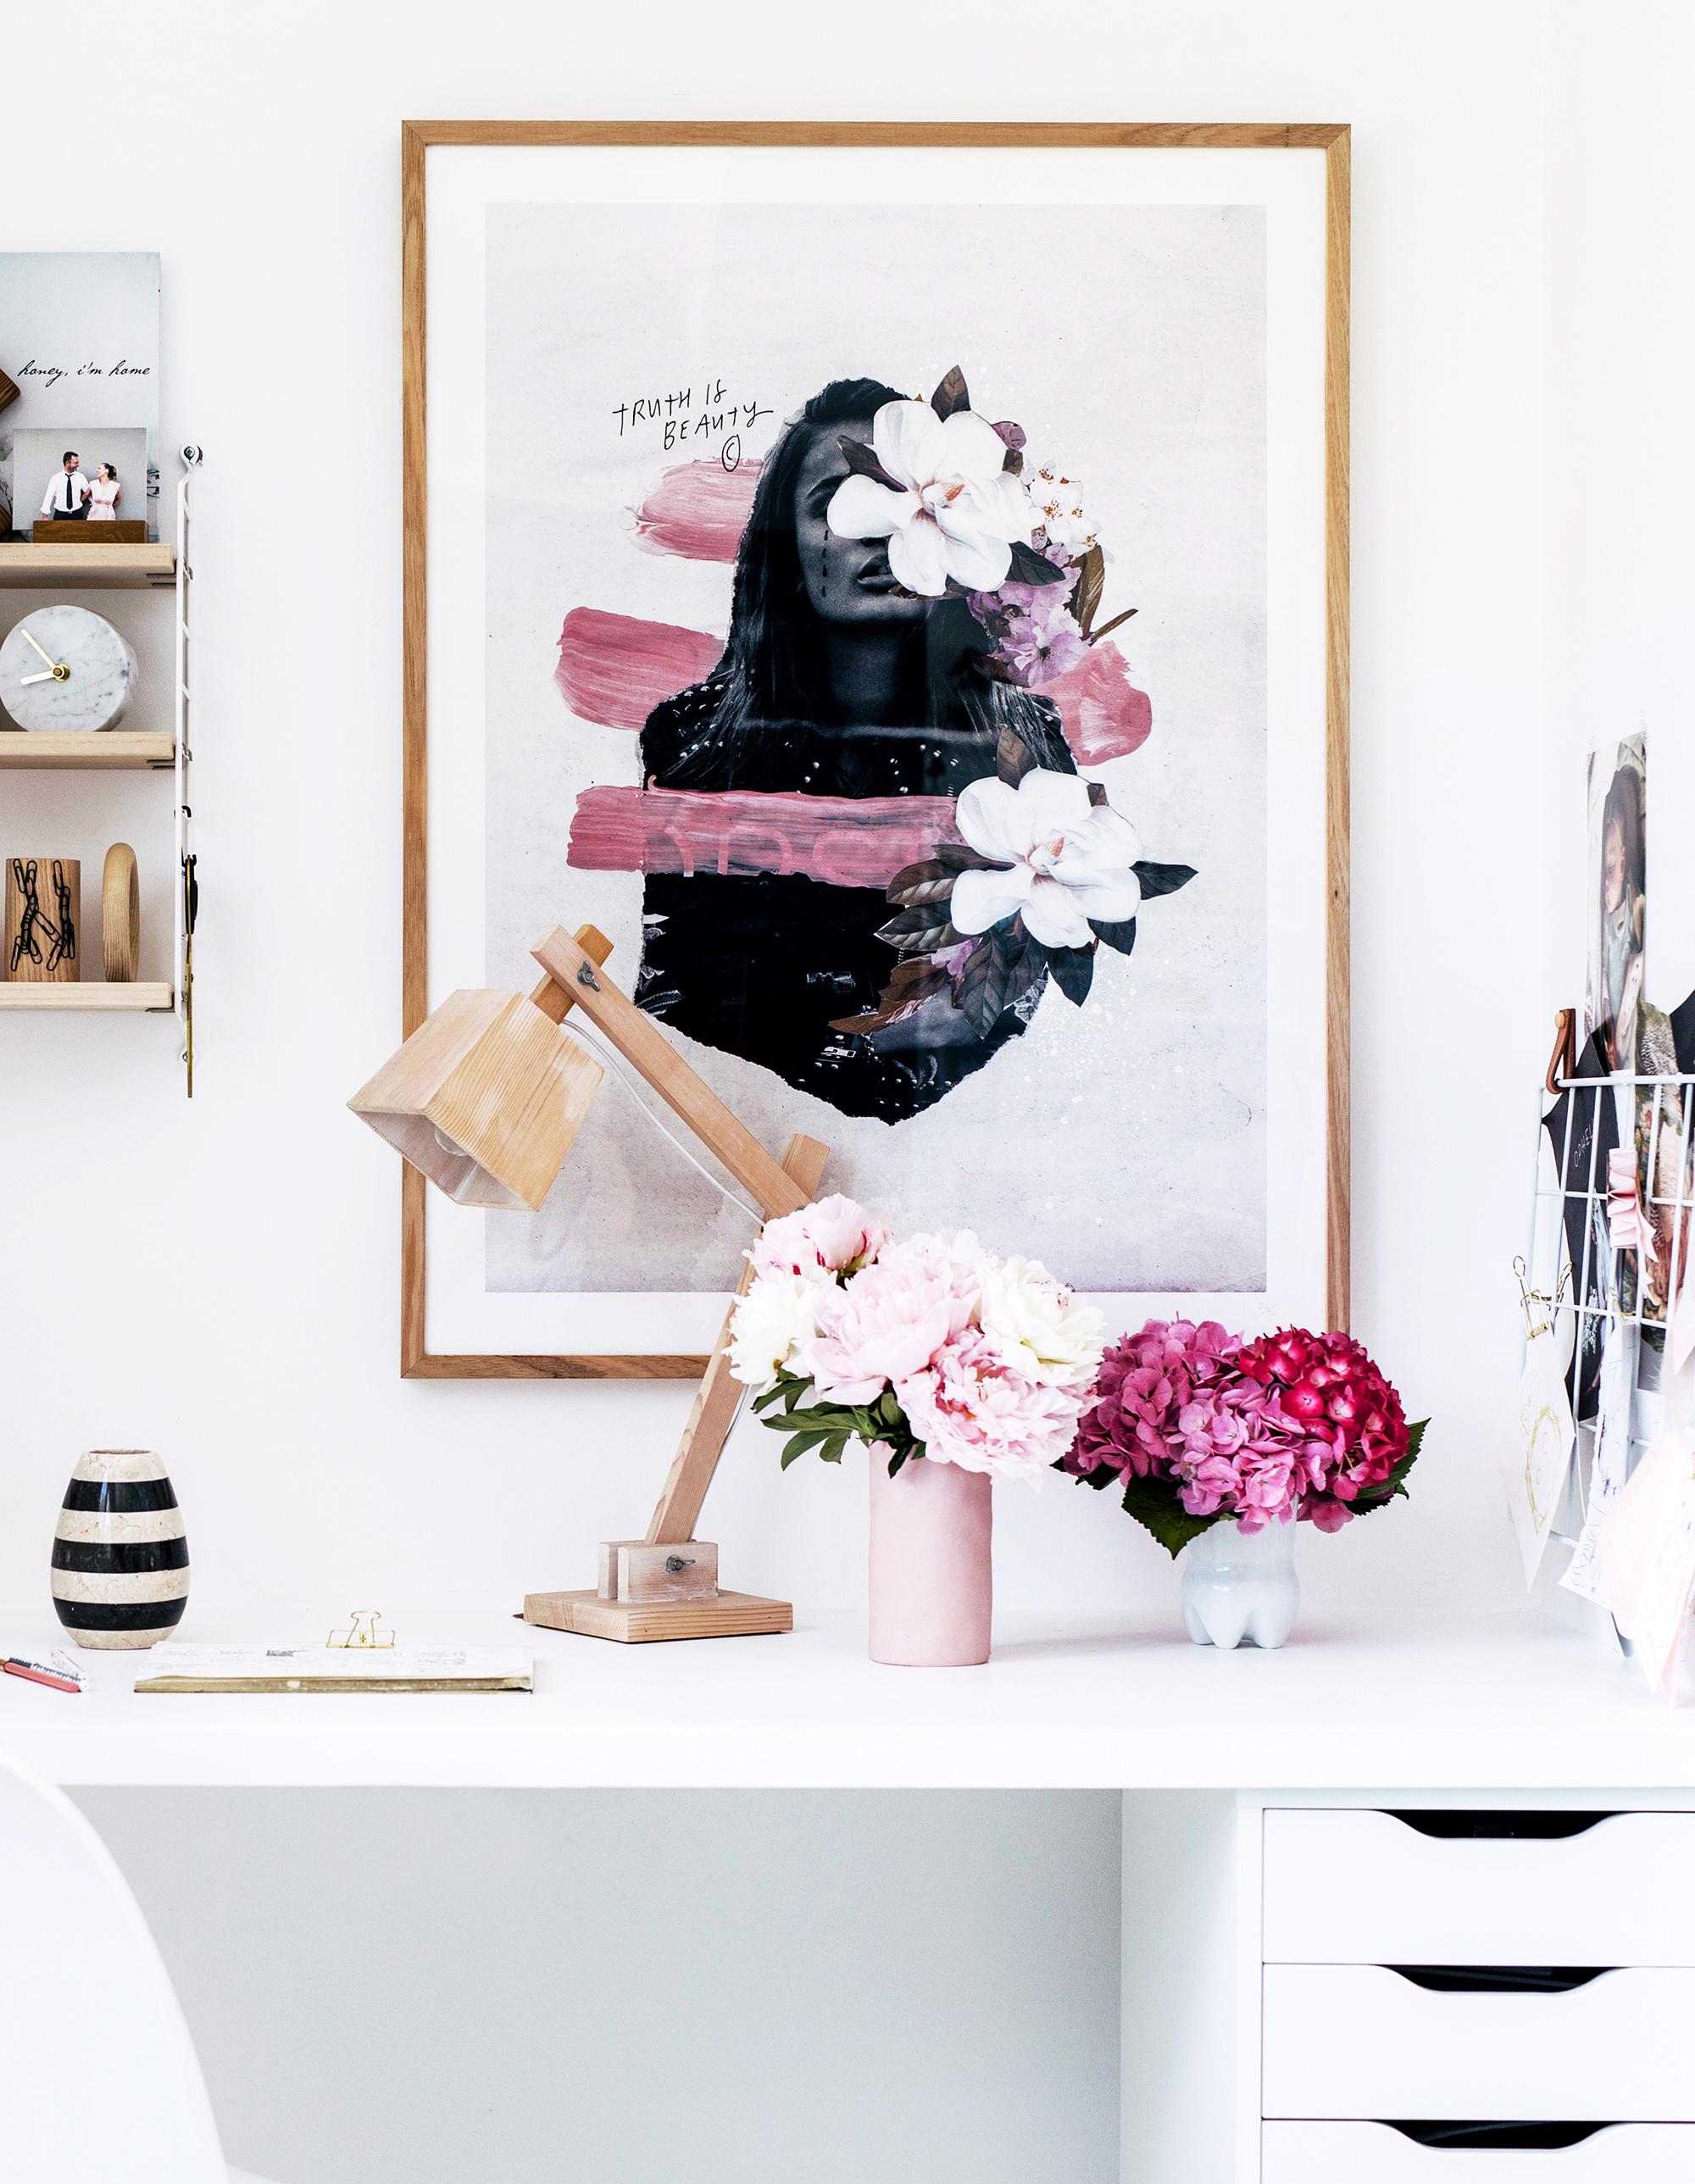 Interior design  Nicola Greenaway  /   Photography  Hannah Blackmore  /   Styling  Claudia Stephenson  /  Truth is Beauty print by Blacklist